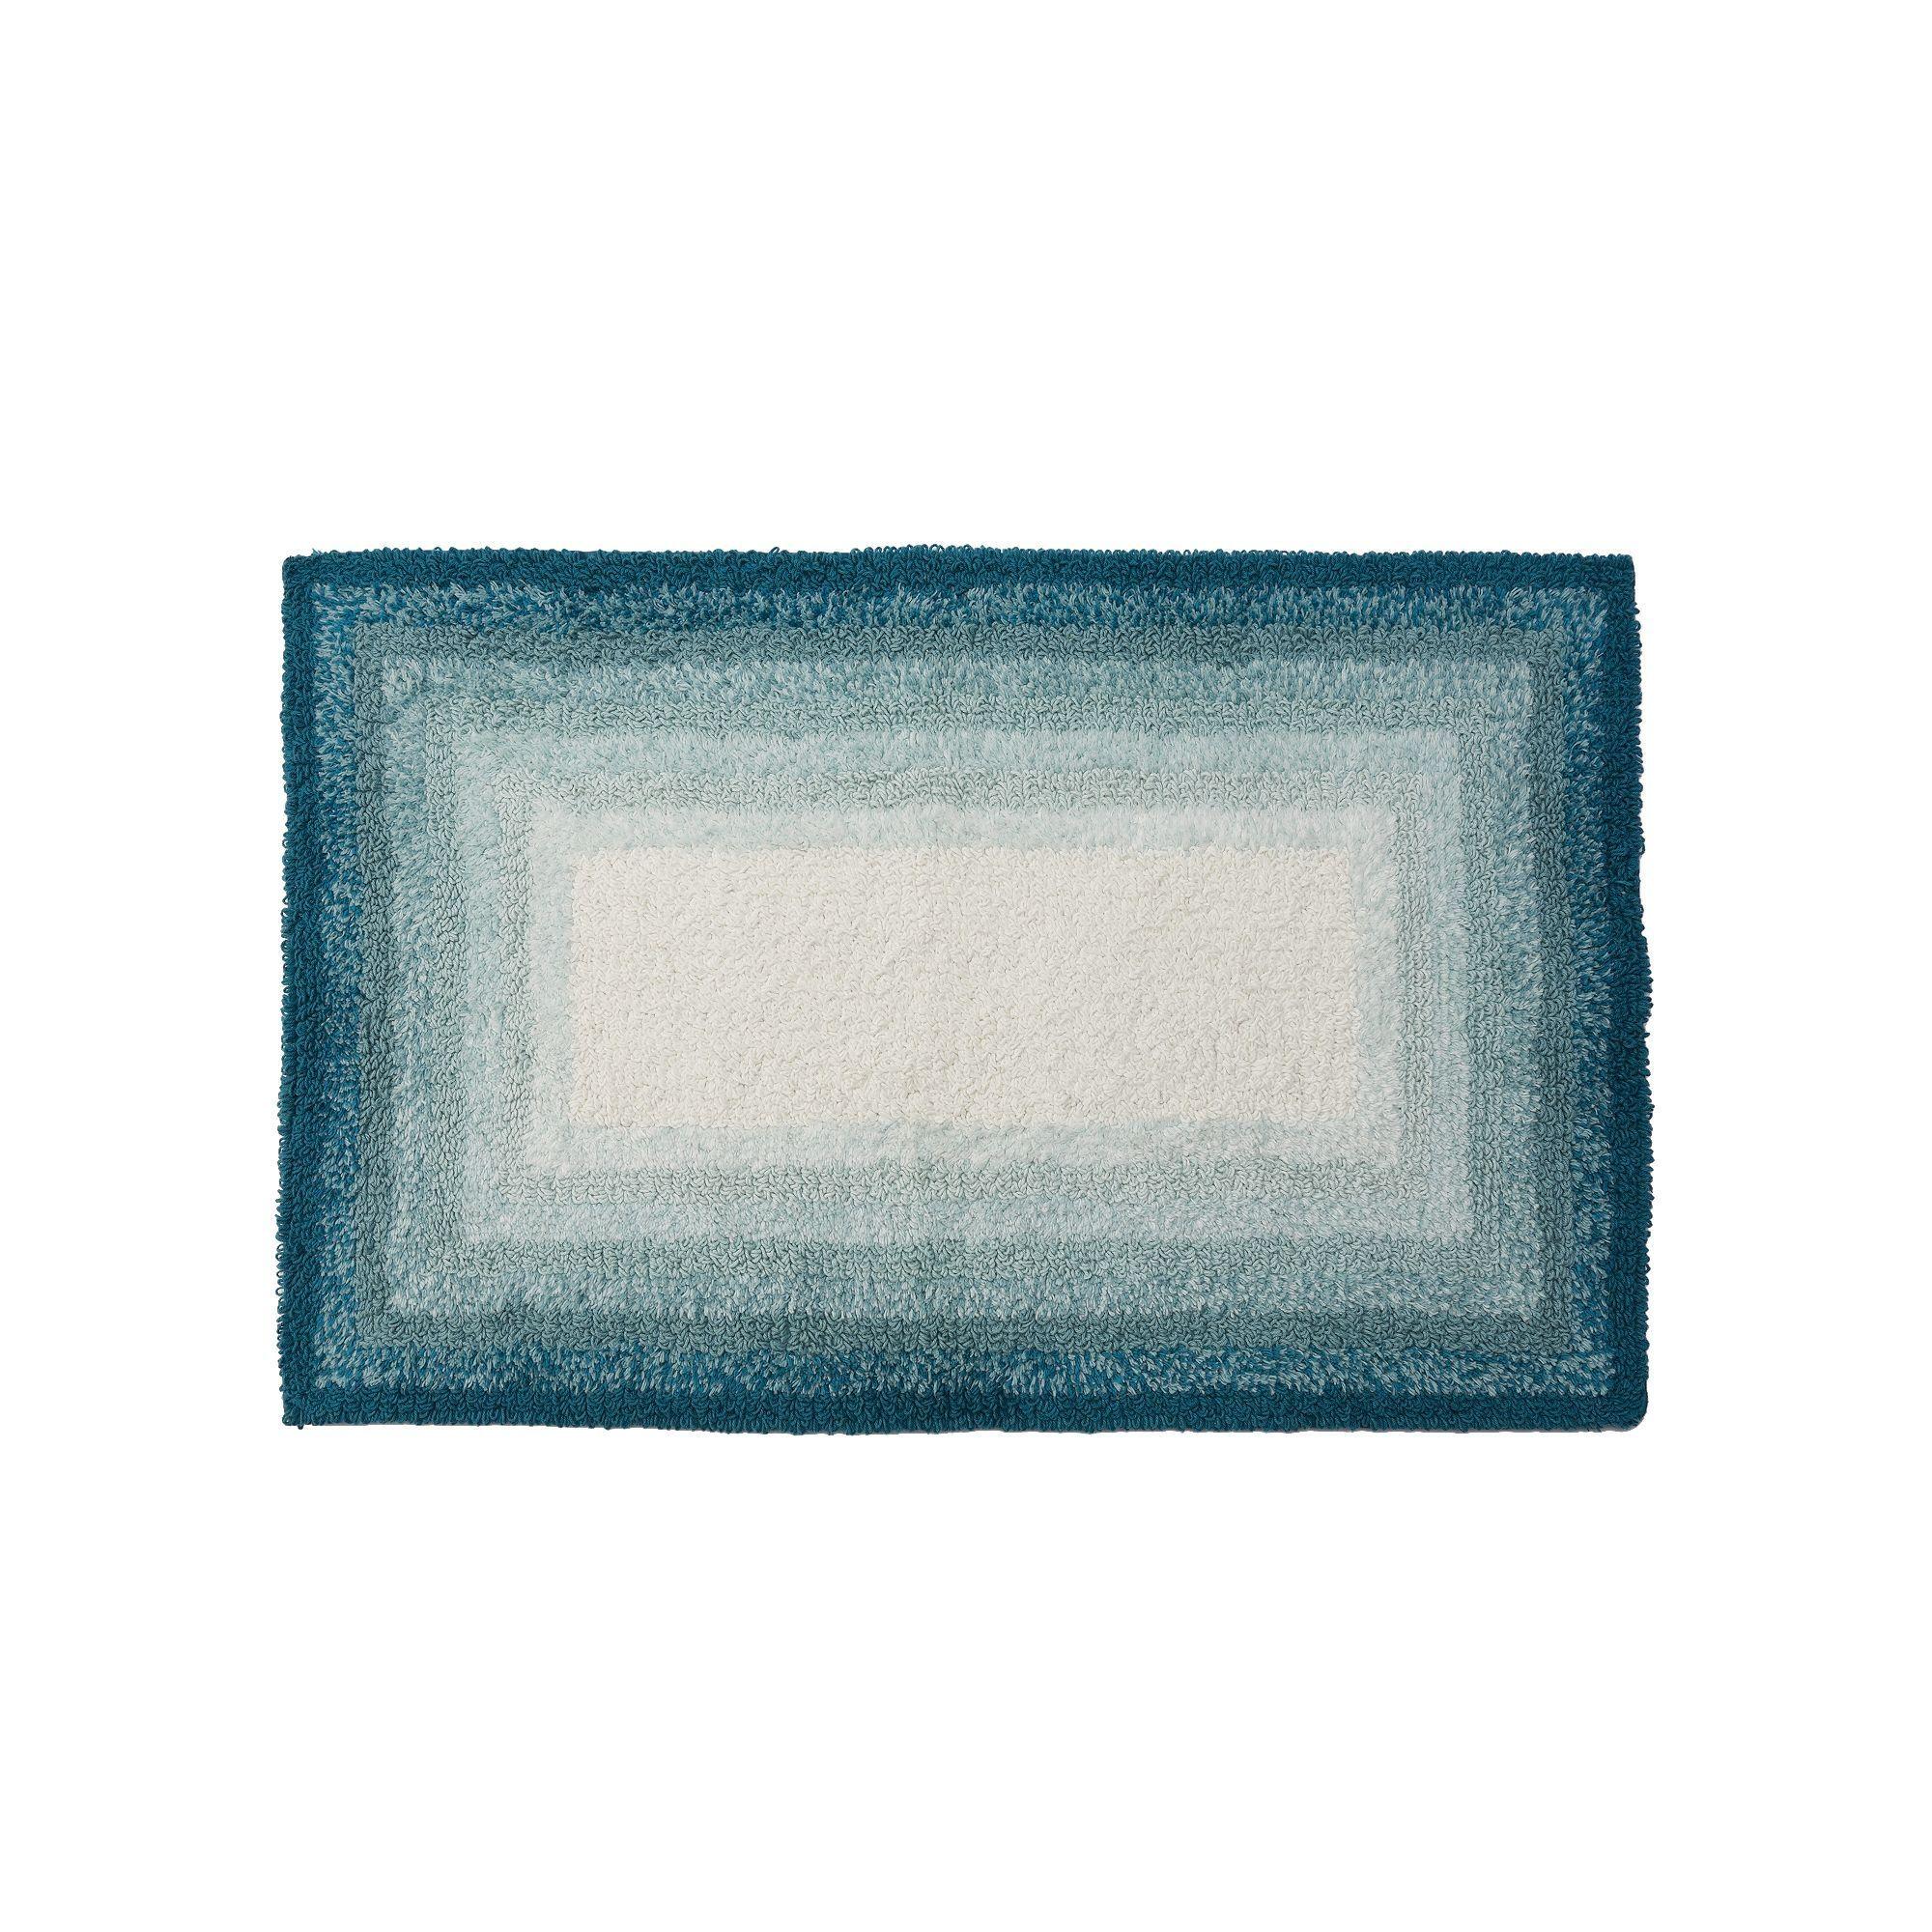 SONOMA Goods for Life™ Ombre Border Reversible Bath Rug, Turquoise/Blue (Turq/Aqua)